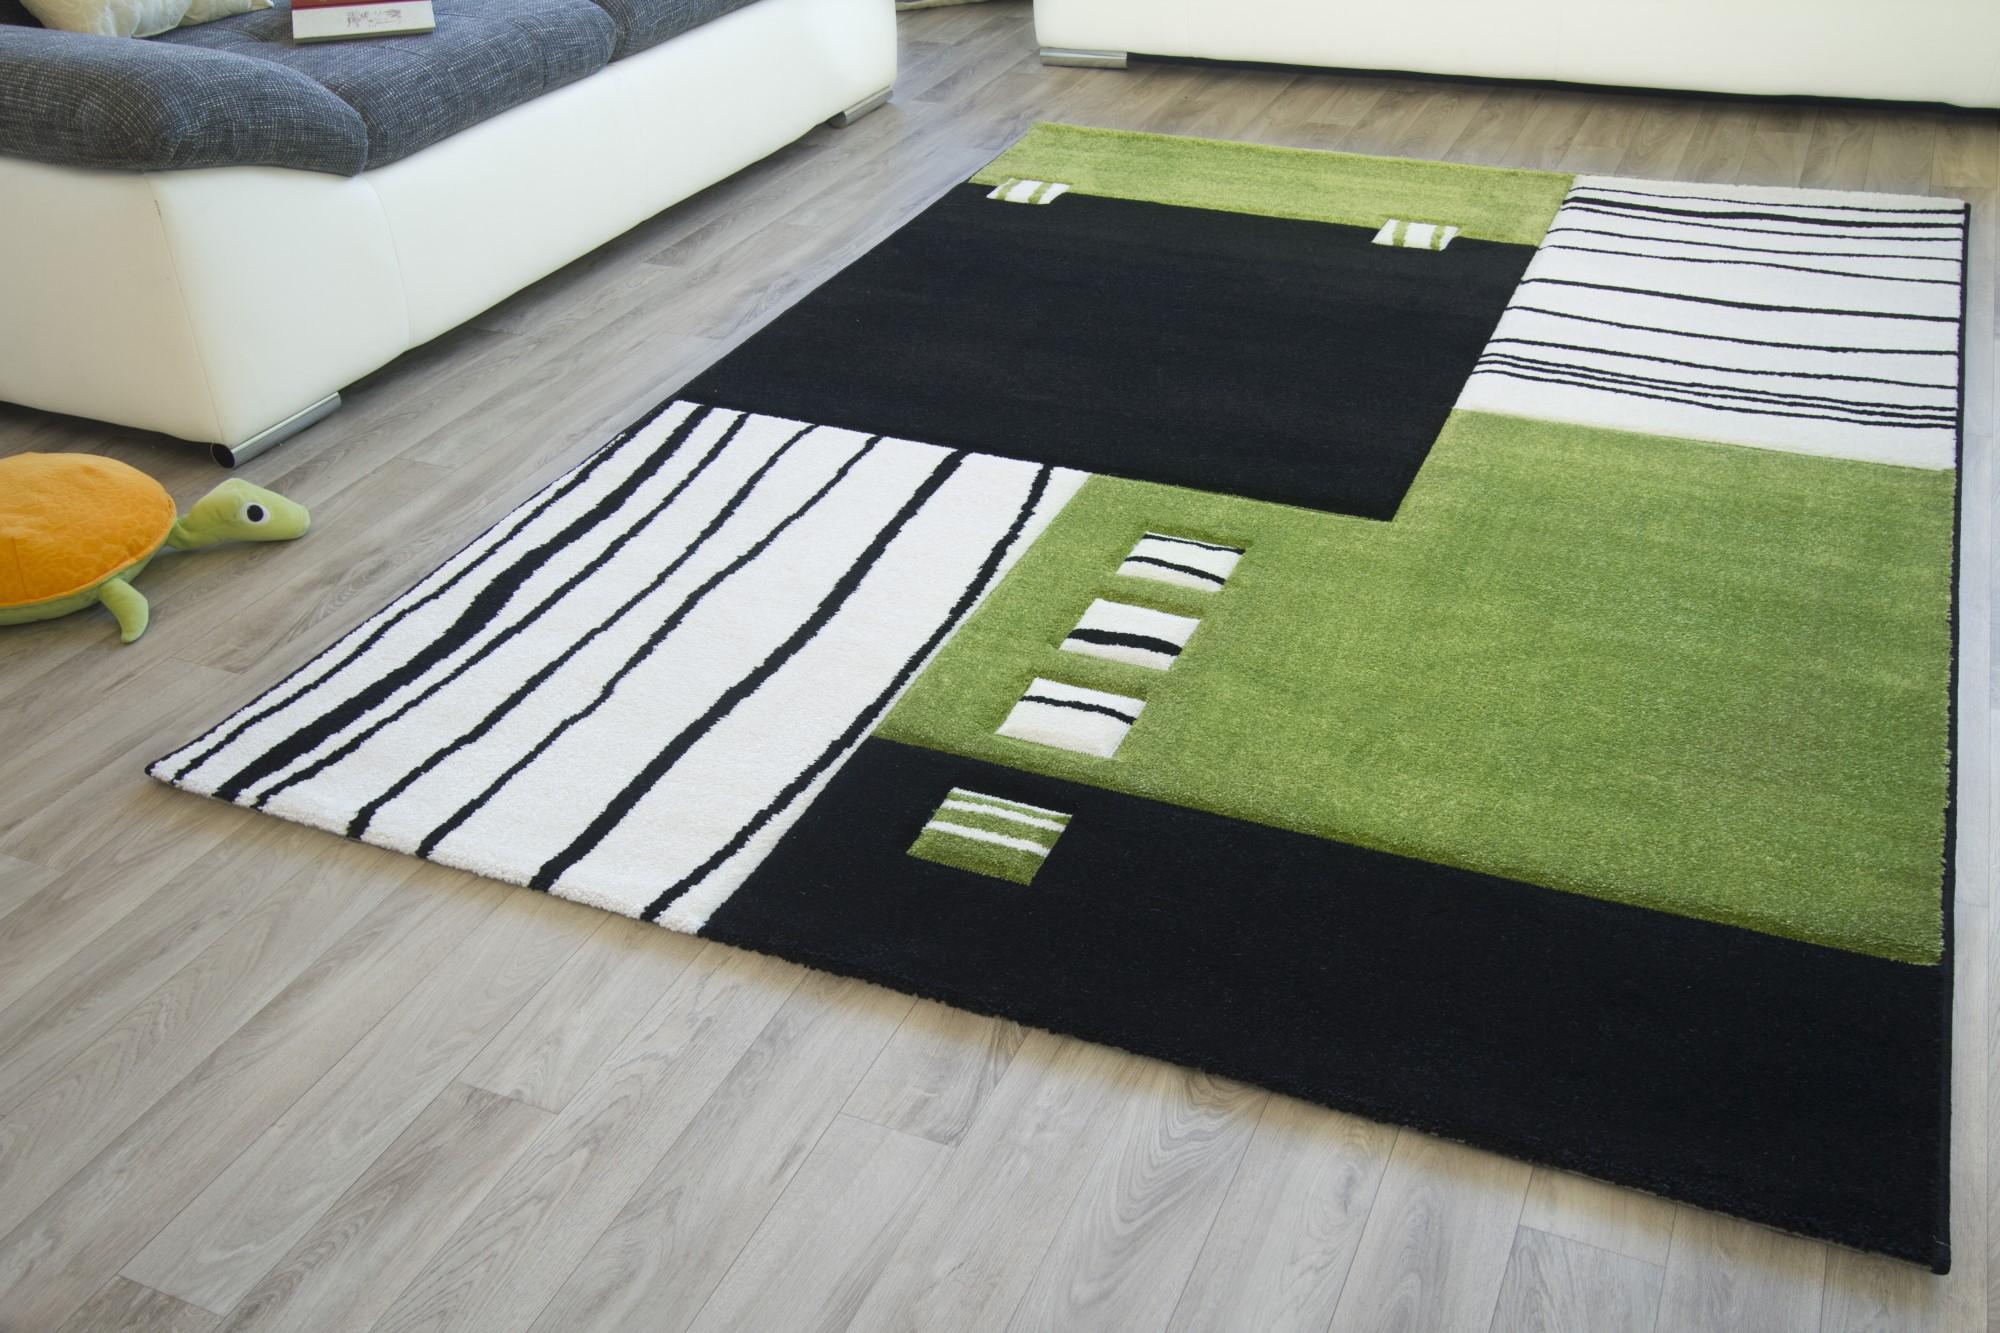 Designer teppich modern ancona felder muster rot orange grau grün